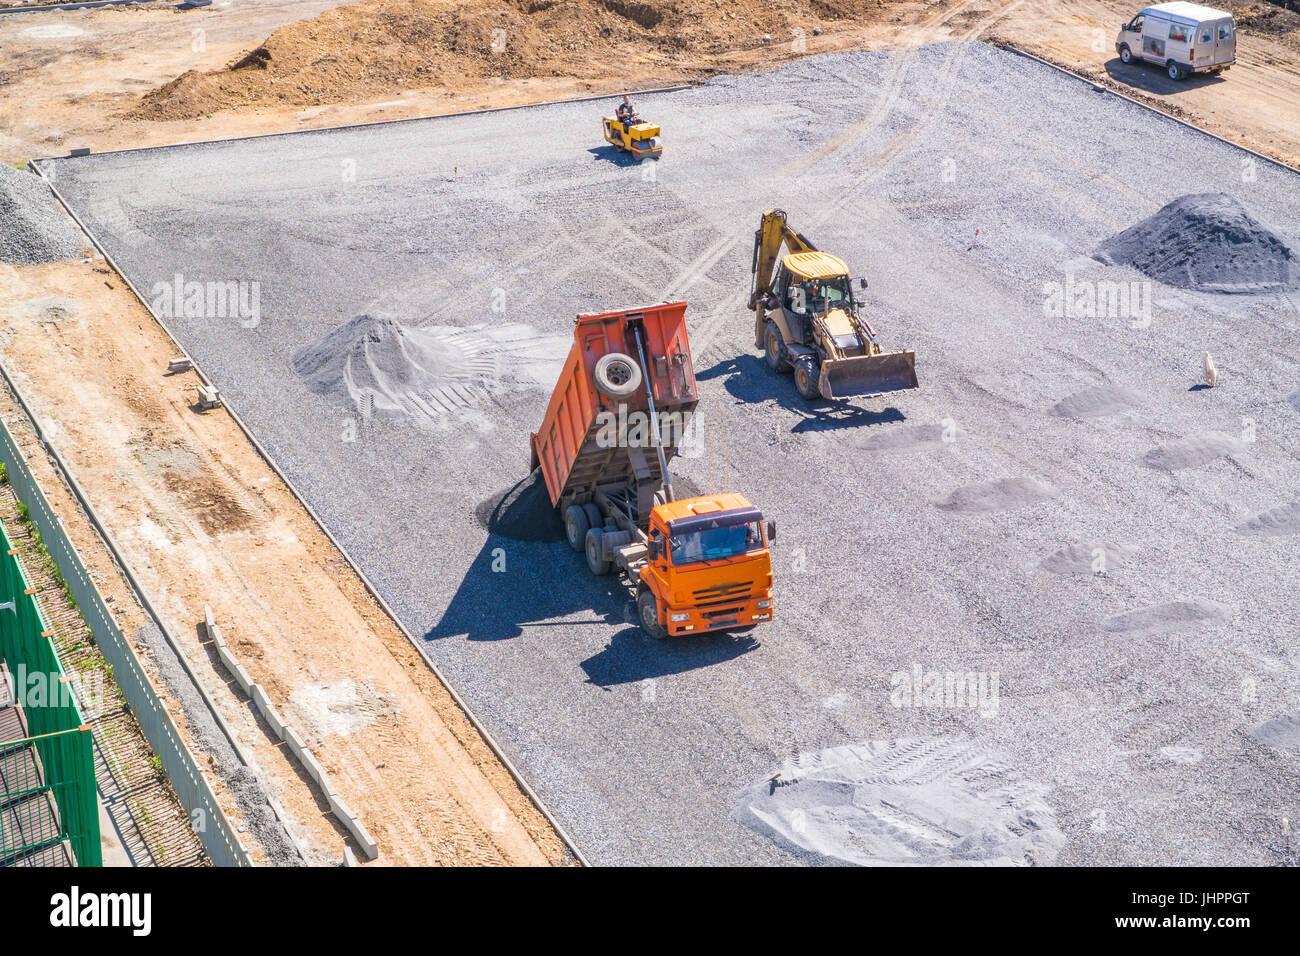 Dump truck unloads asphalt at the construction site of the school stadium. - Stock Image